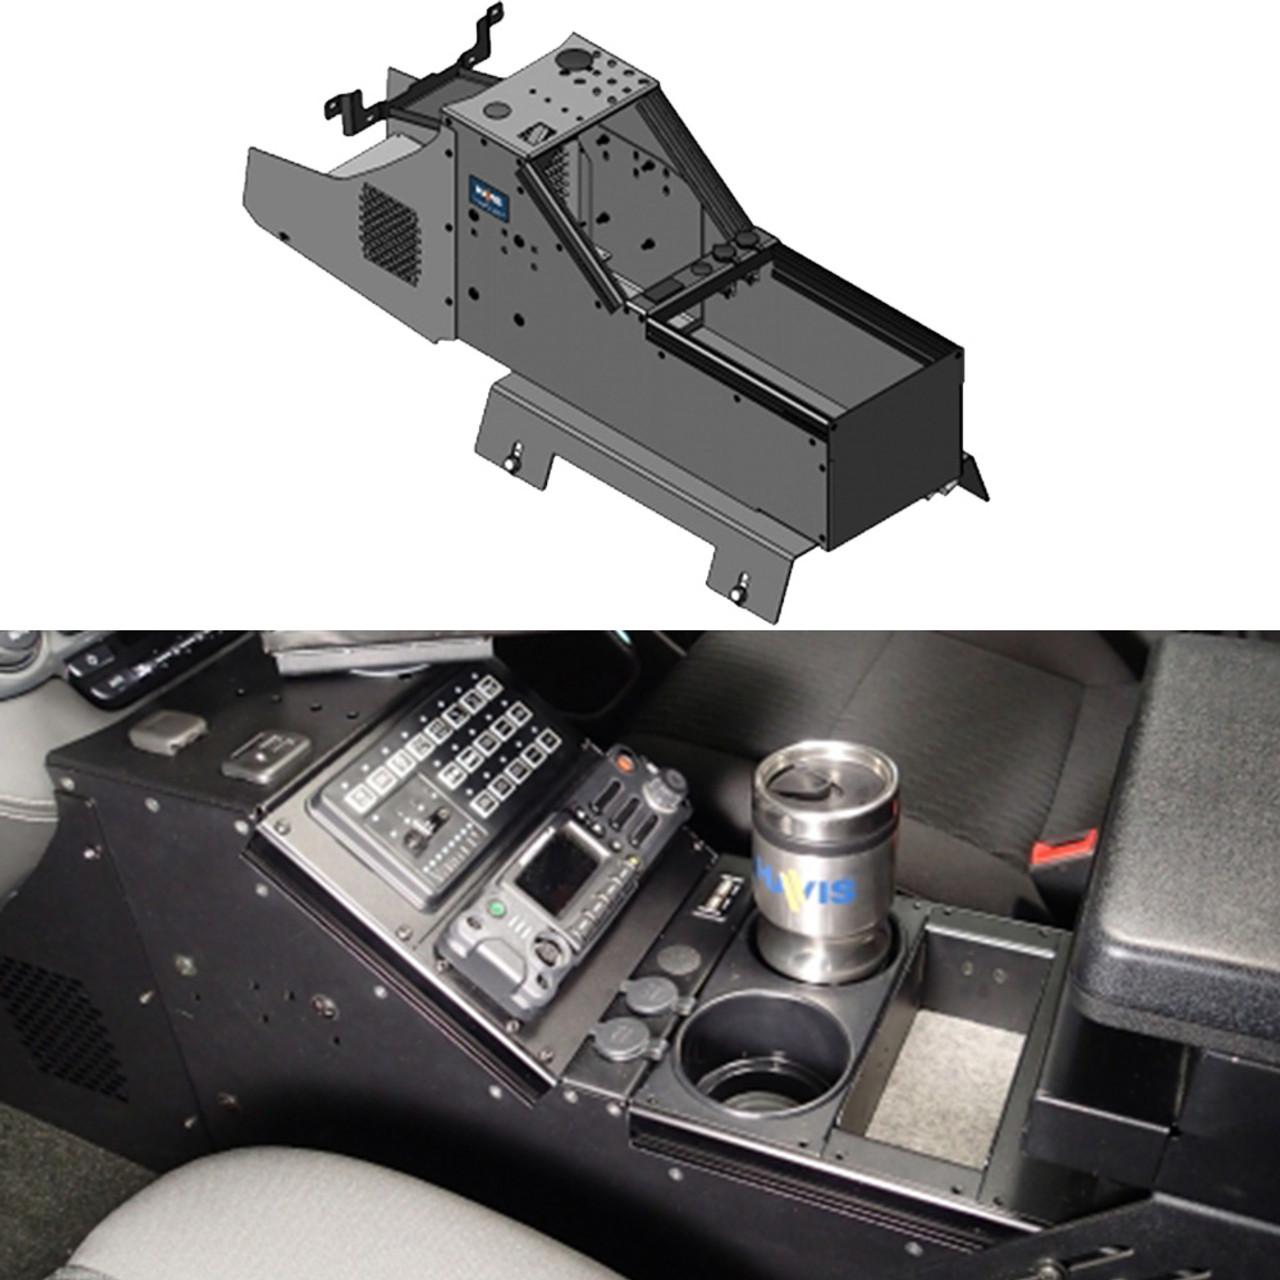 medium resolution of havis c vs 0812 tah 1 20 inch vehicle specific console for